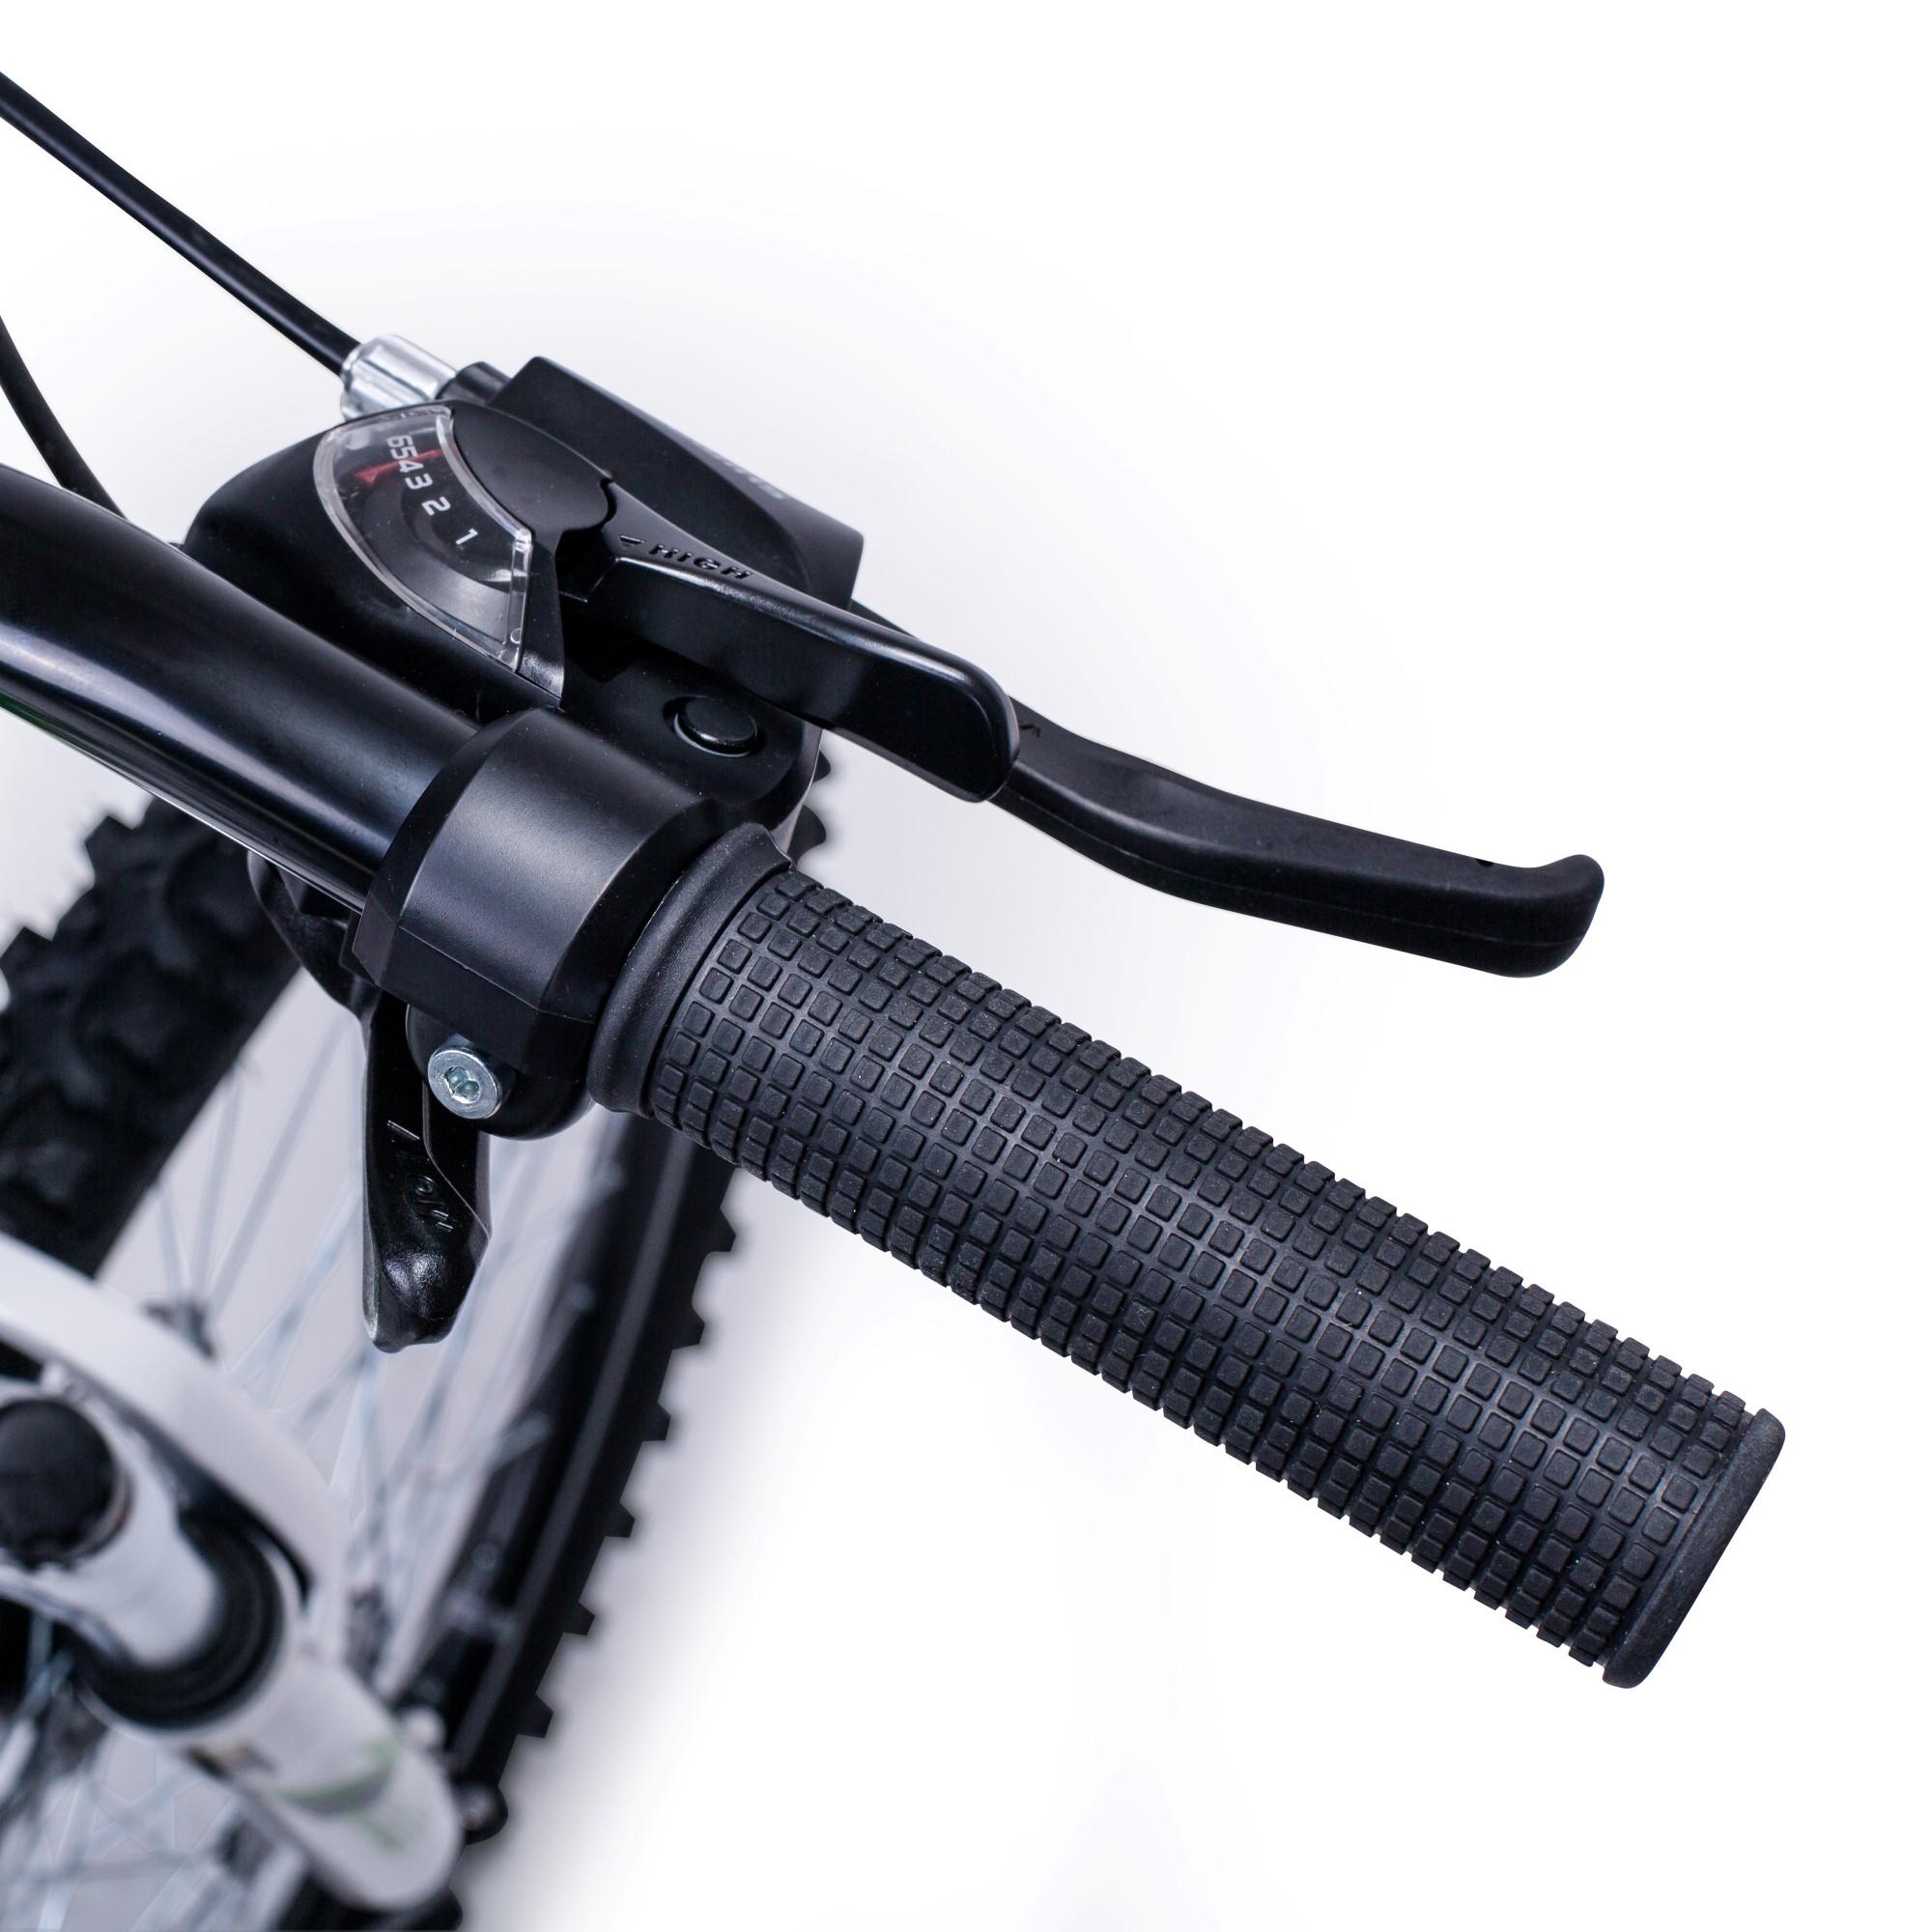 24″ Mountainbike Montreal – Bergsteiger Fahrräder   Mountainbikes ...